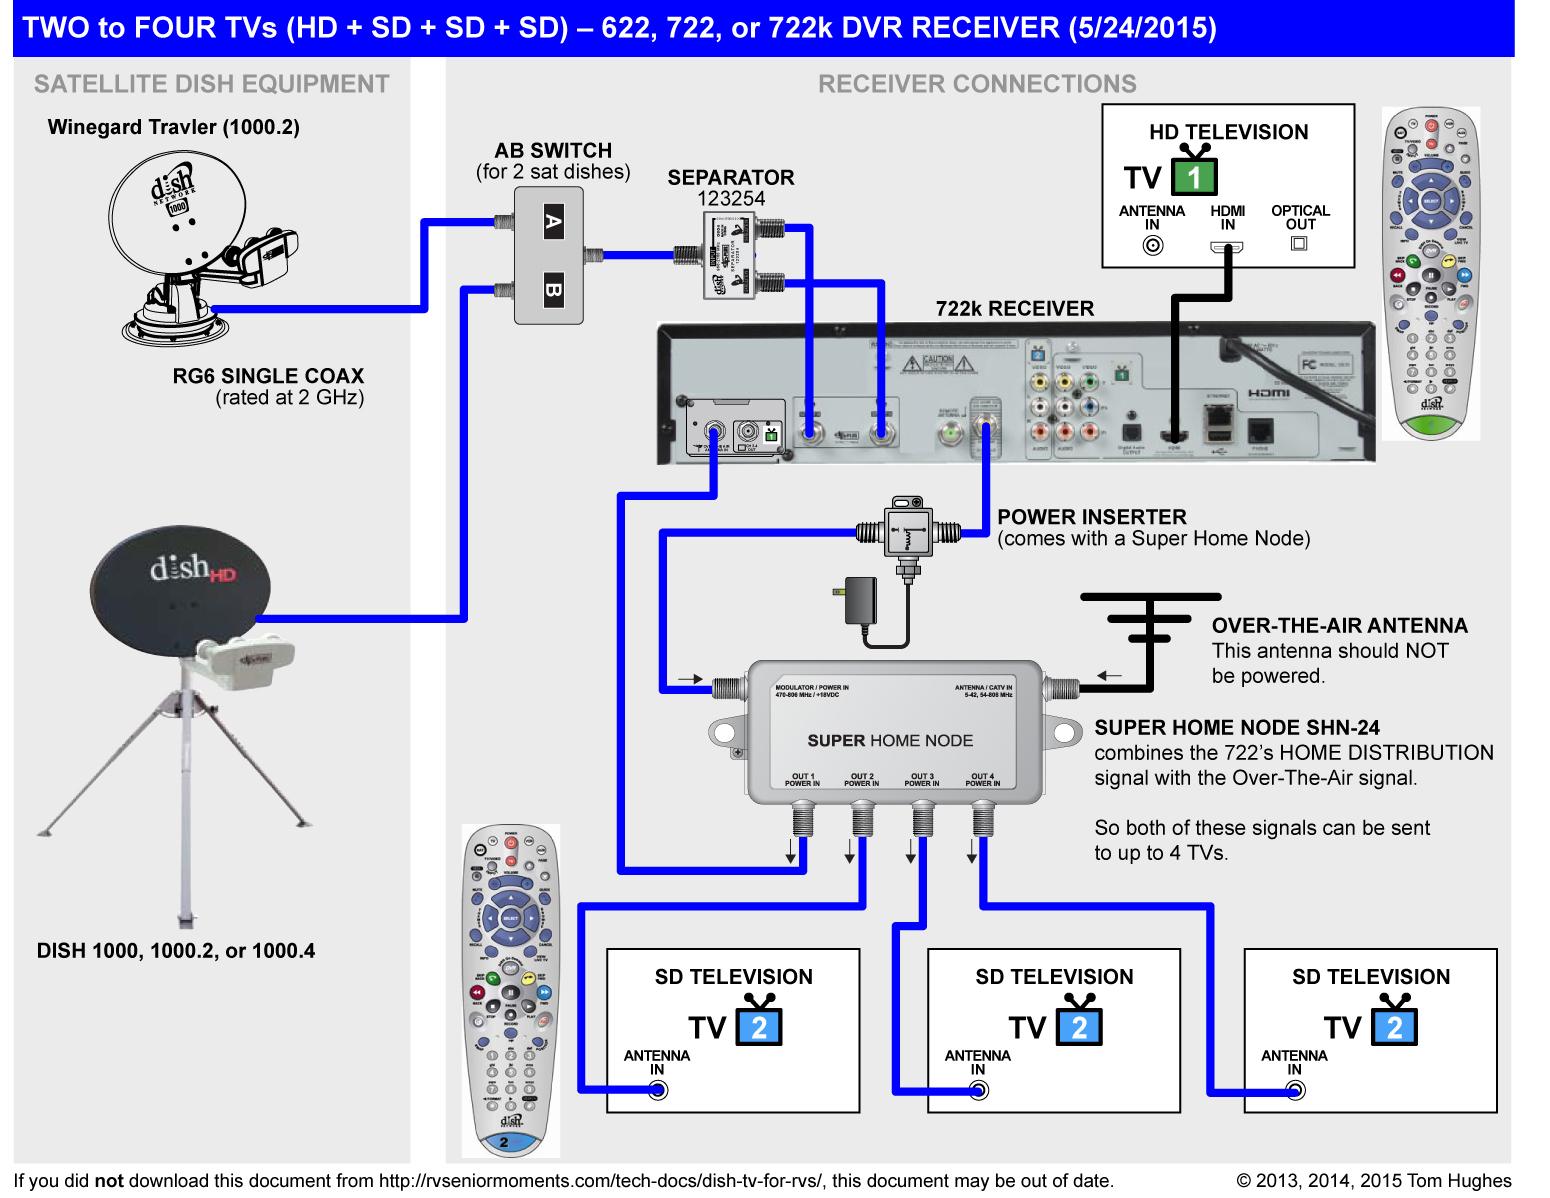 Dishtv Wiring Diagram - Wiring Diagram Data Oreo - Ethernet Cable Wiring Diagram